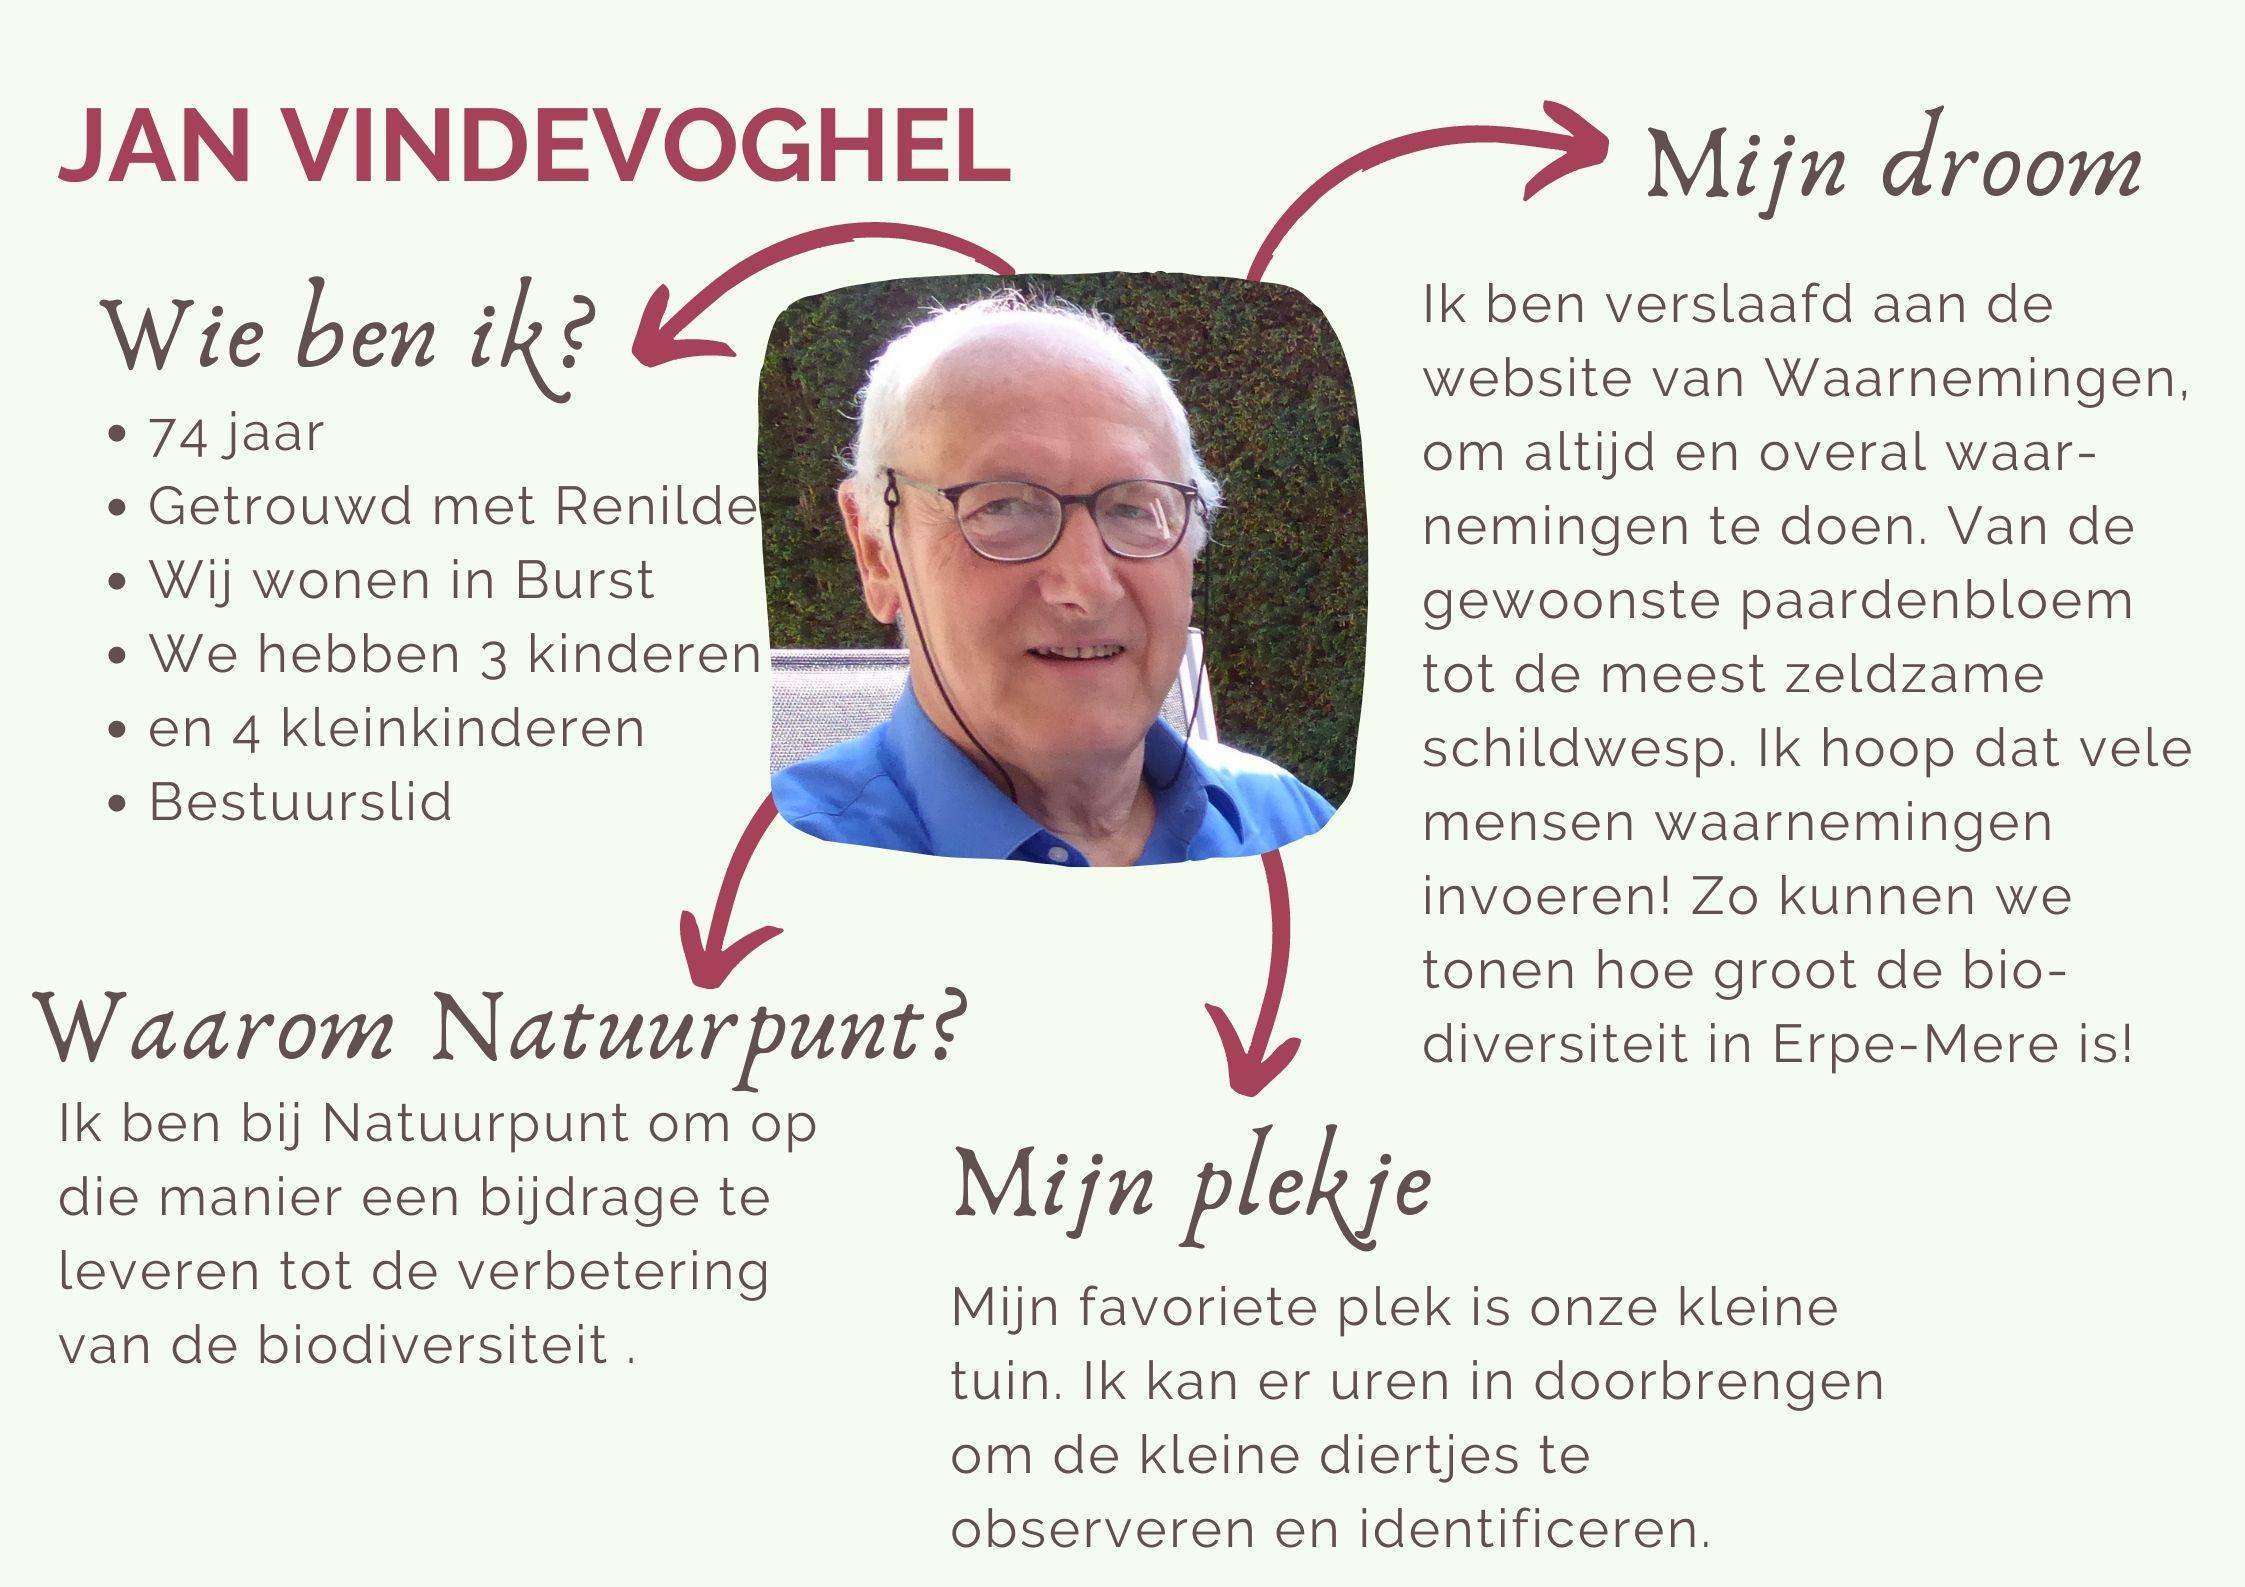 Jan Vindevoghel